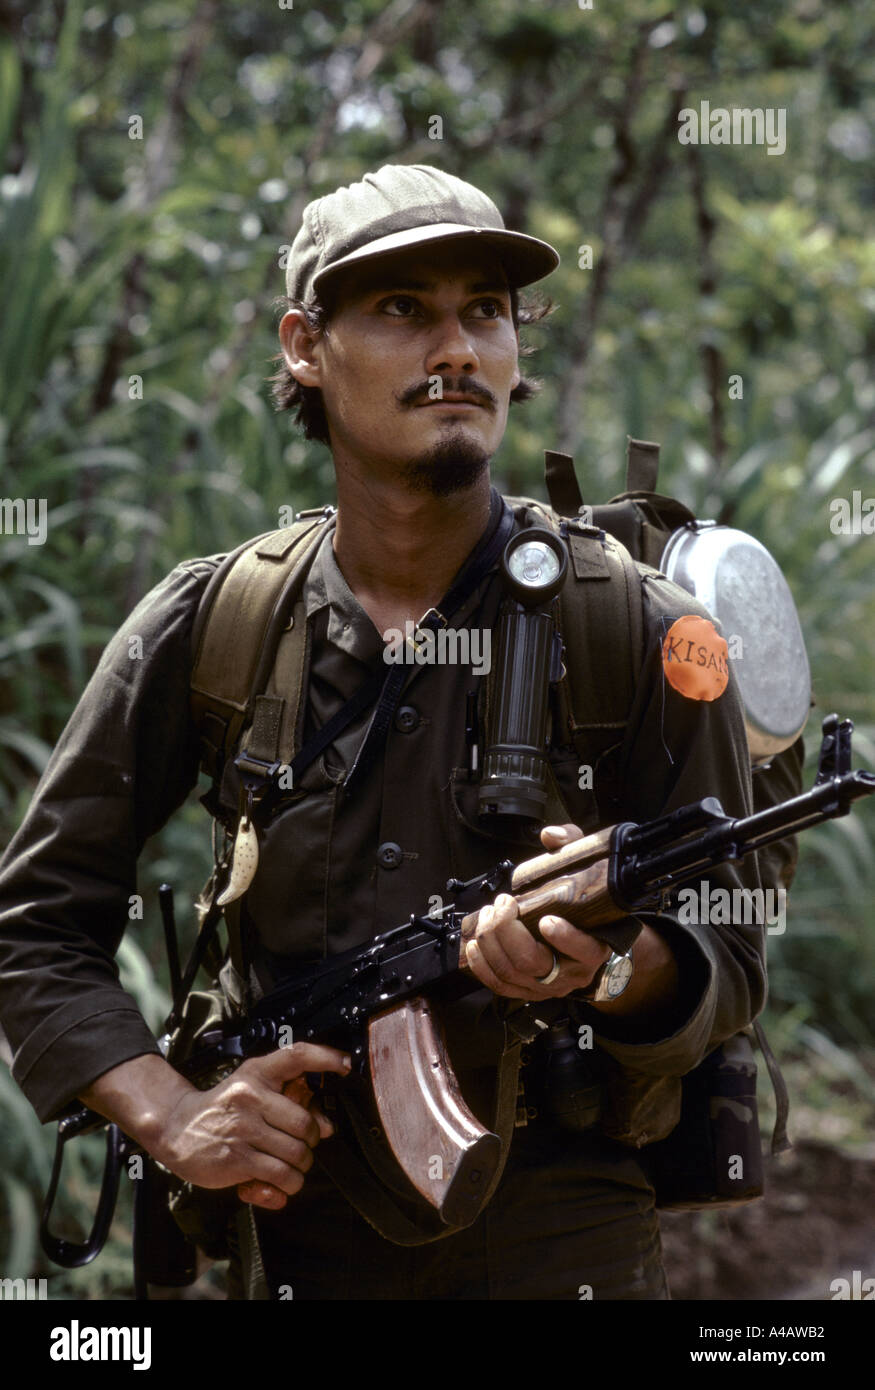 Kisan anti-Sandinista rebel Miskito Indian Contras preparing a raid across the Honduran border into Nicaragua, July Stock Photo